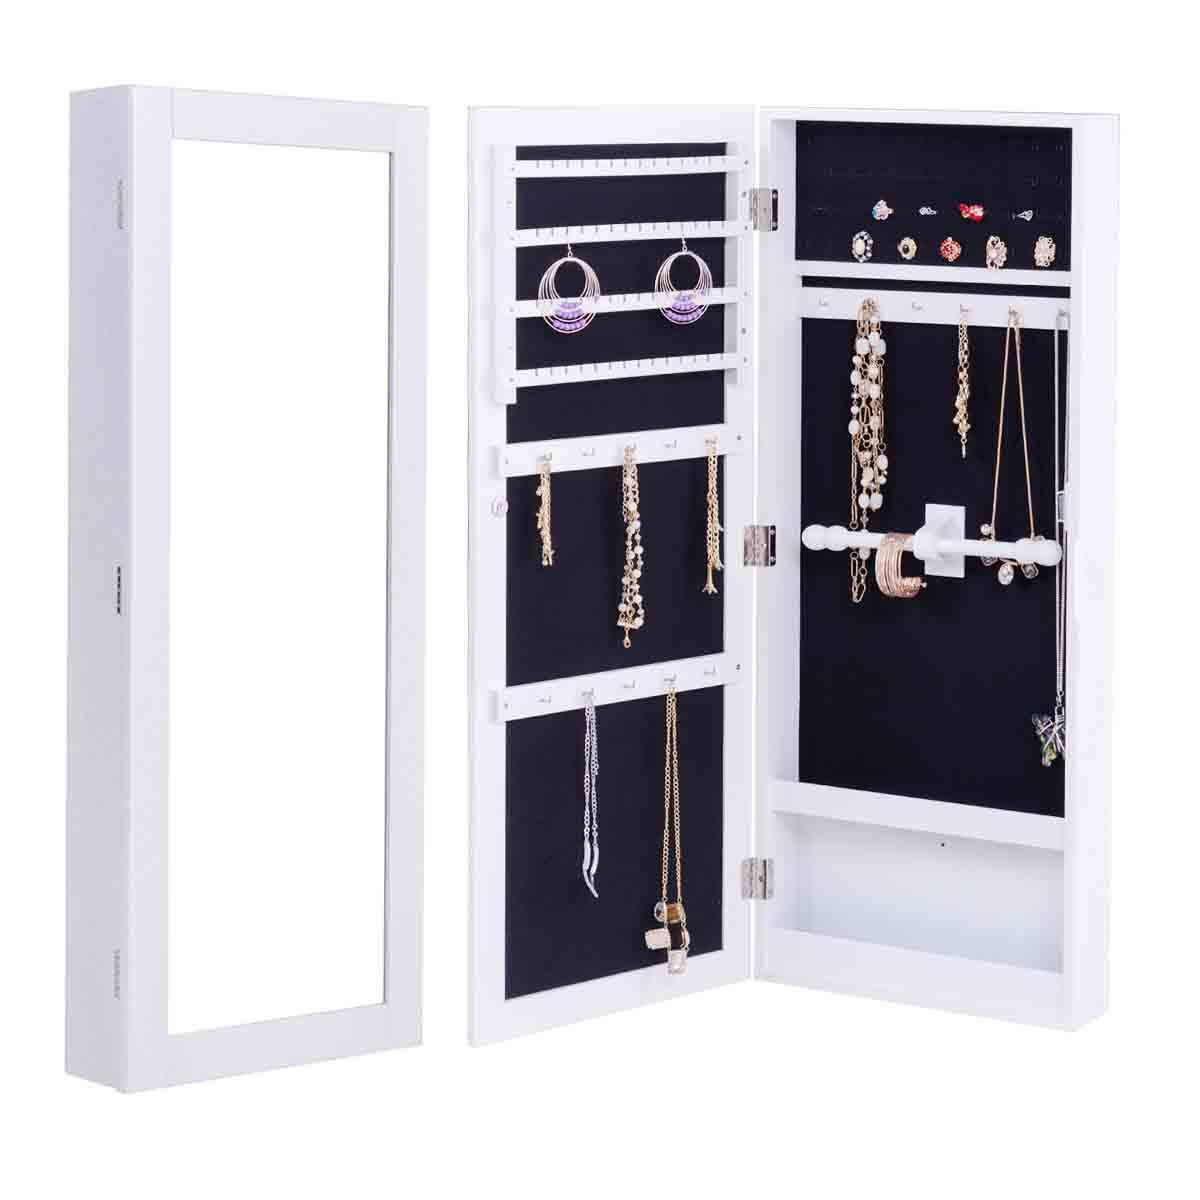 WATERJOY Mirror Jewelry Cabinet Lockable Wall/Door Mounted Storage Jewelry Cabinet Full Length Organizer